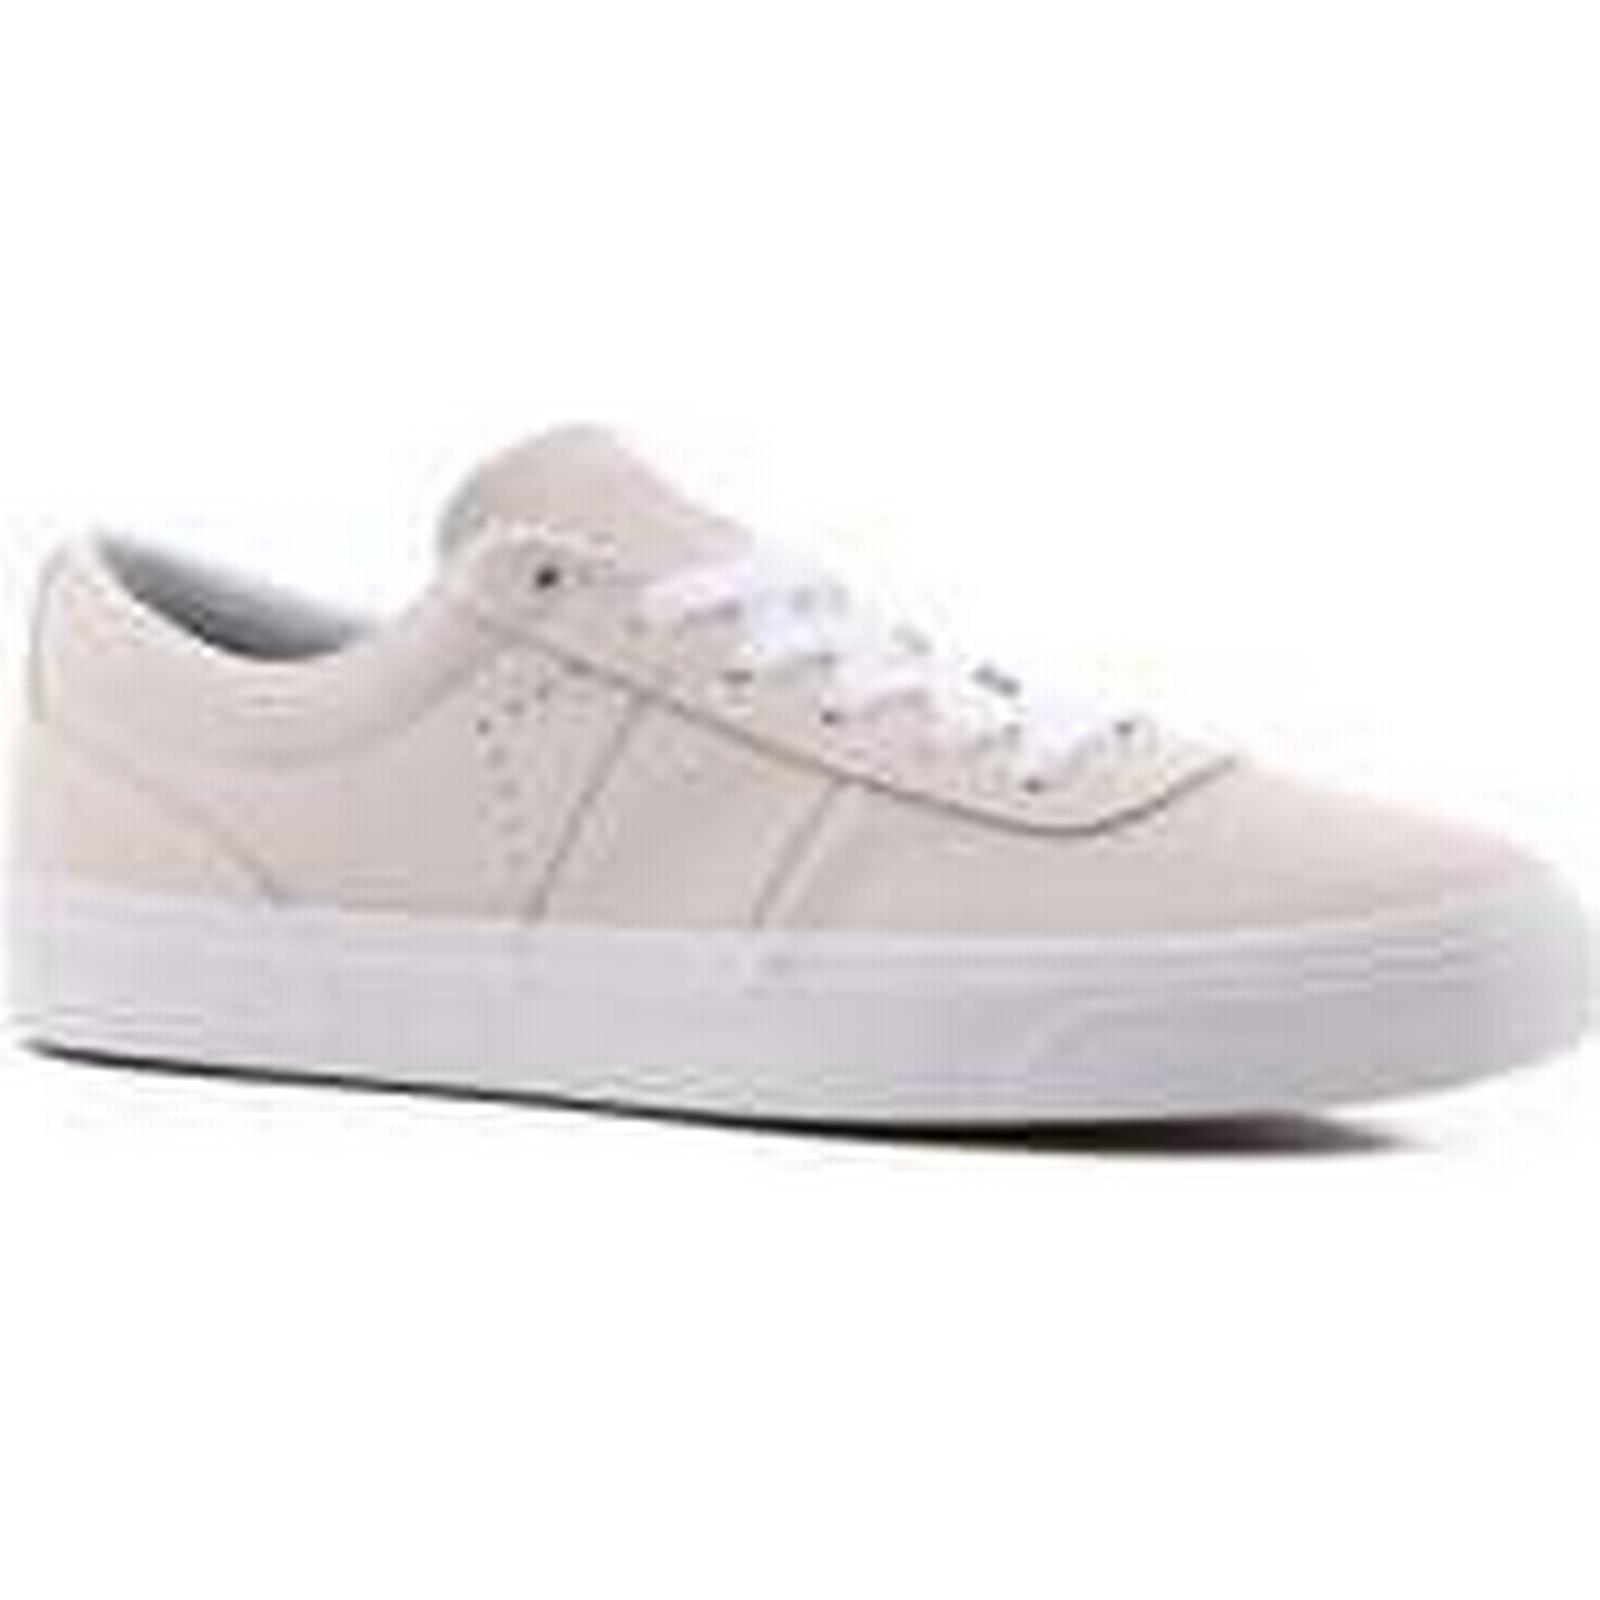 Converse Pro One Star CC Pro Converse Skate Shoes white/green/white 36ac29